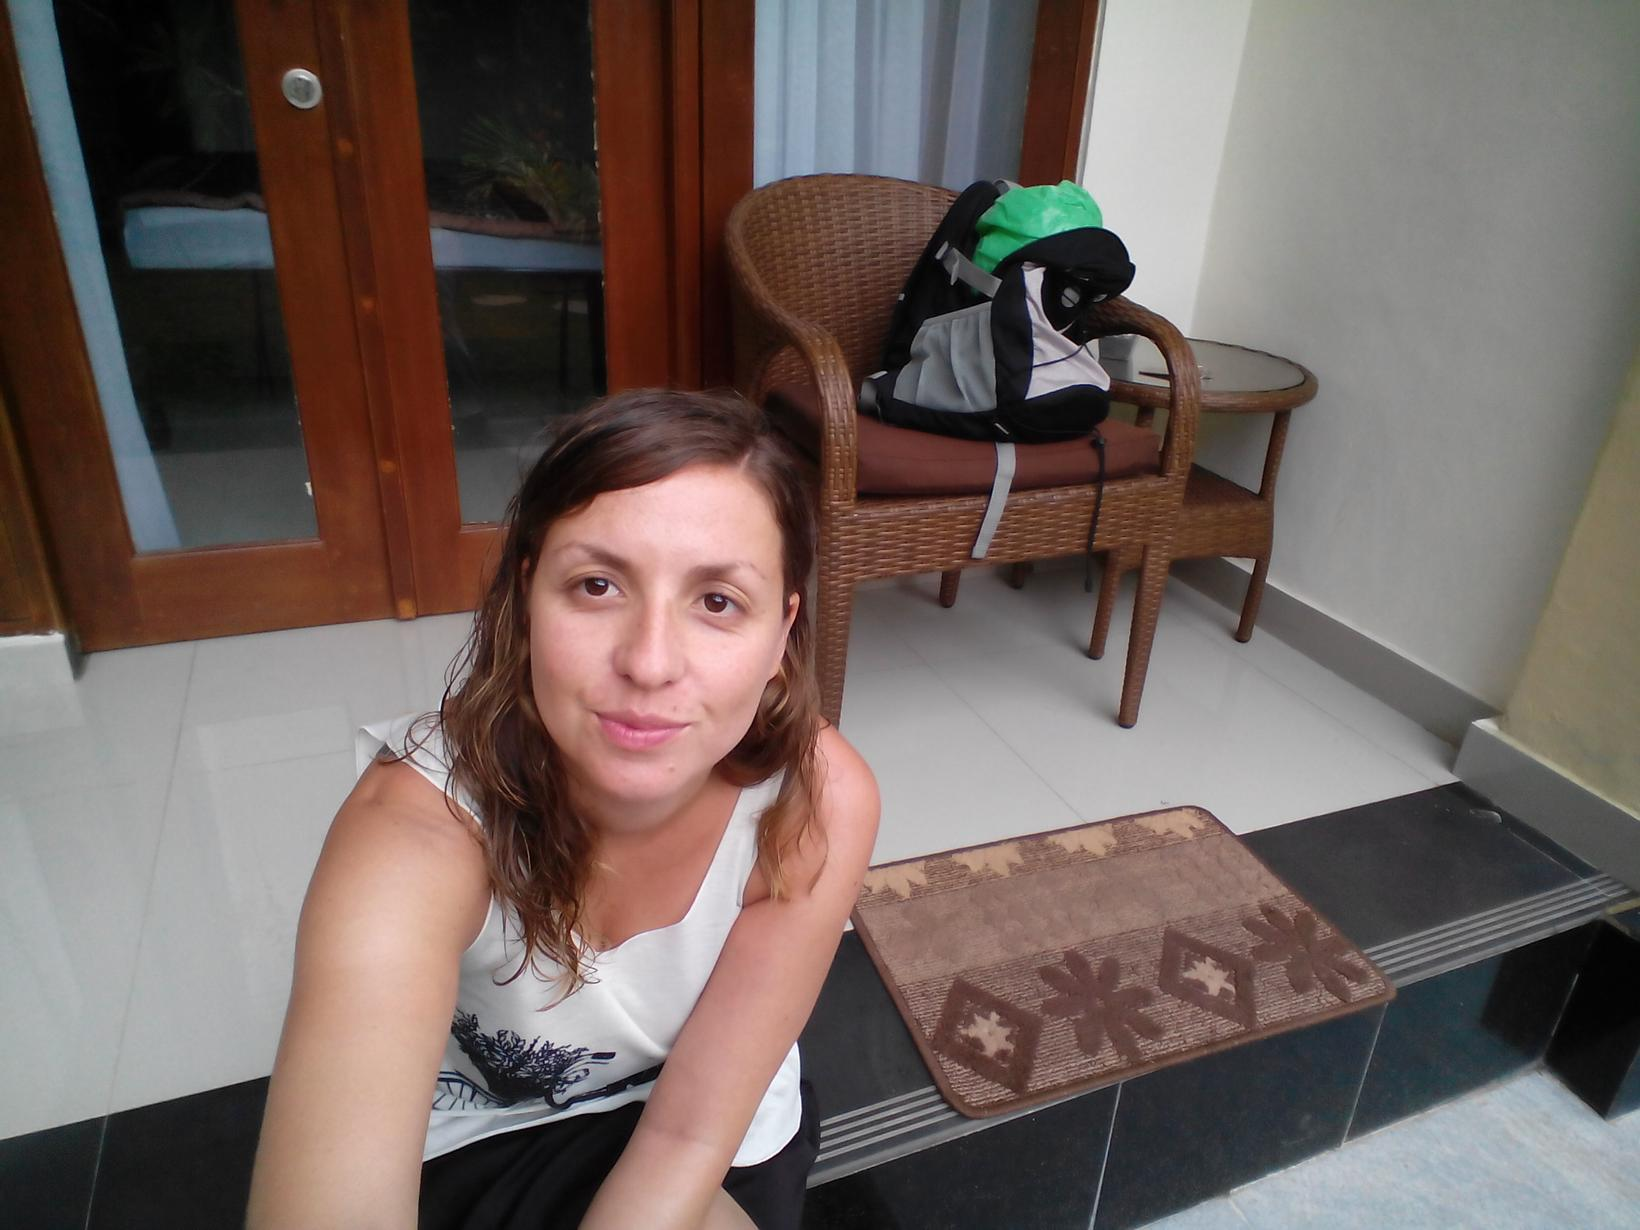 Marta from León, Spain